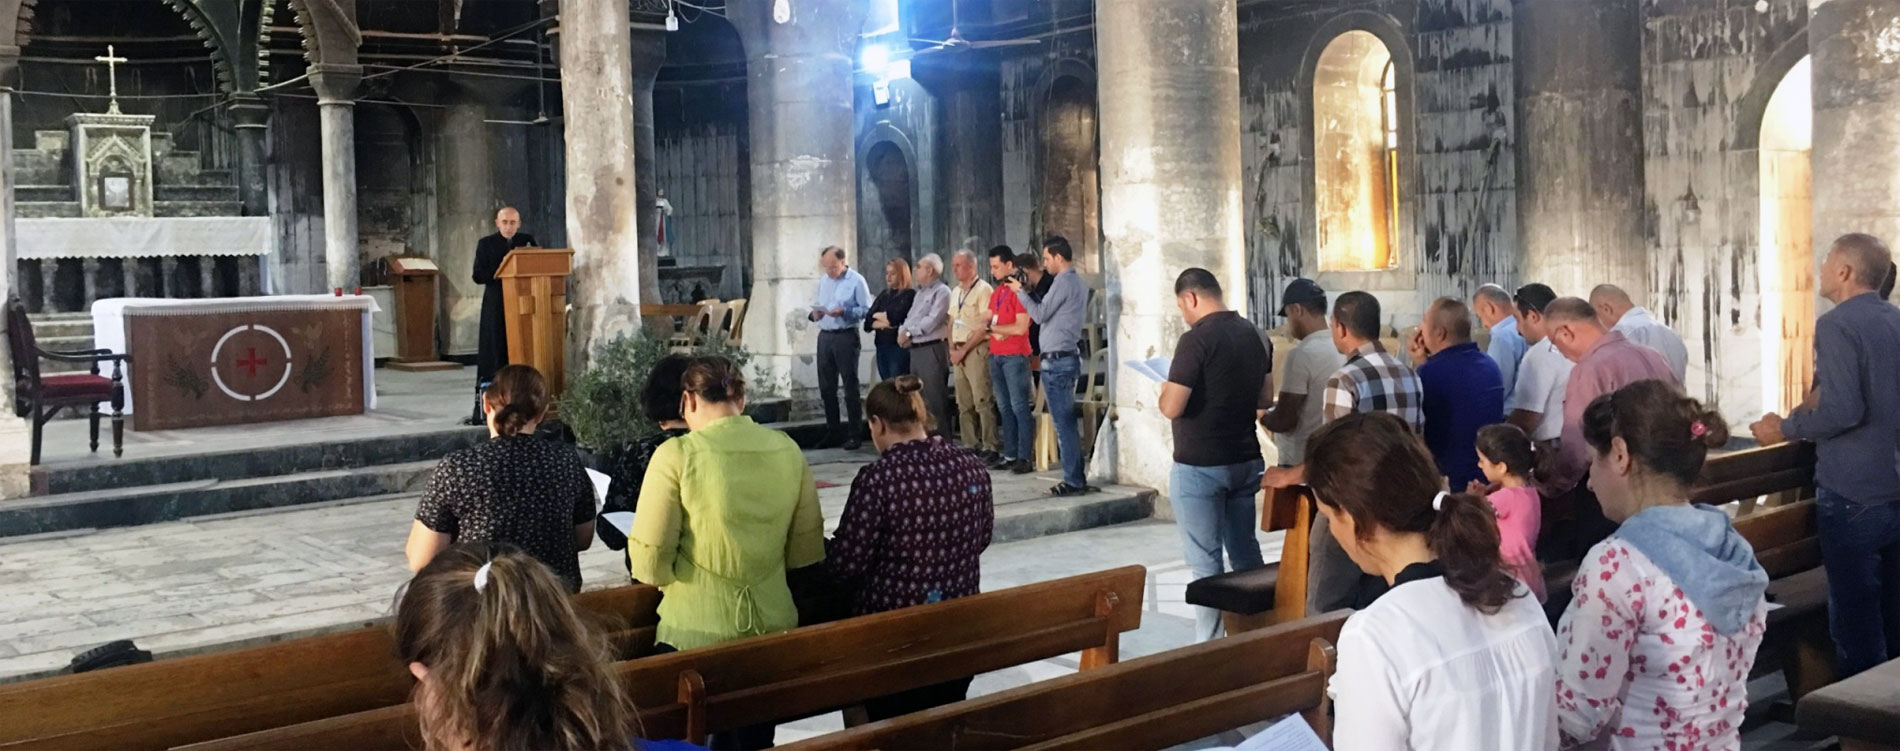 Kirche In Not Shop